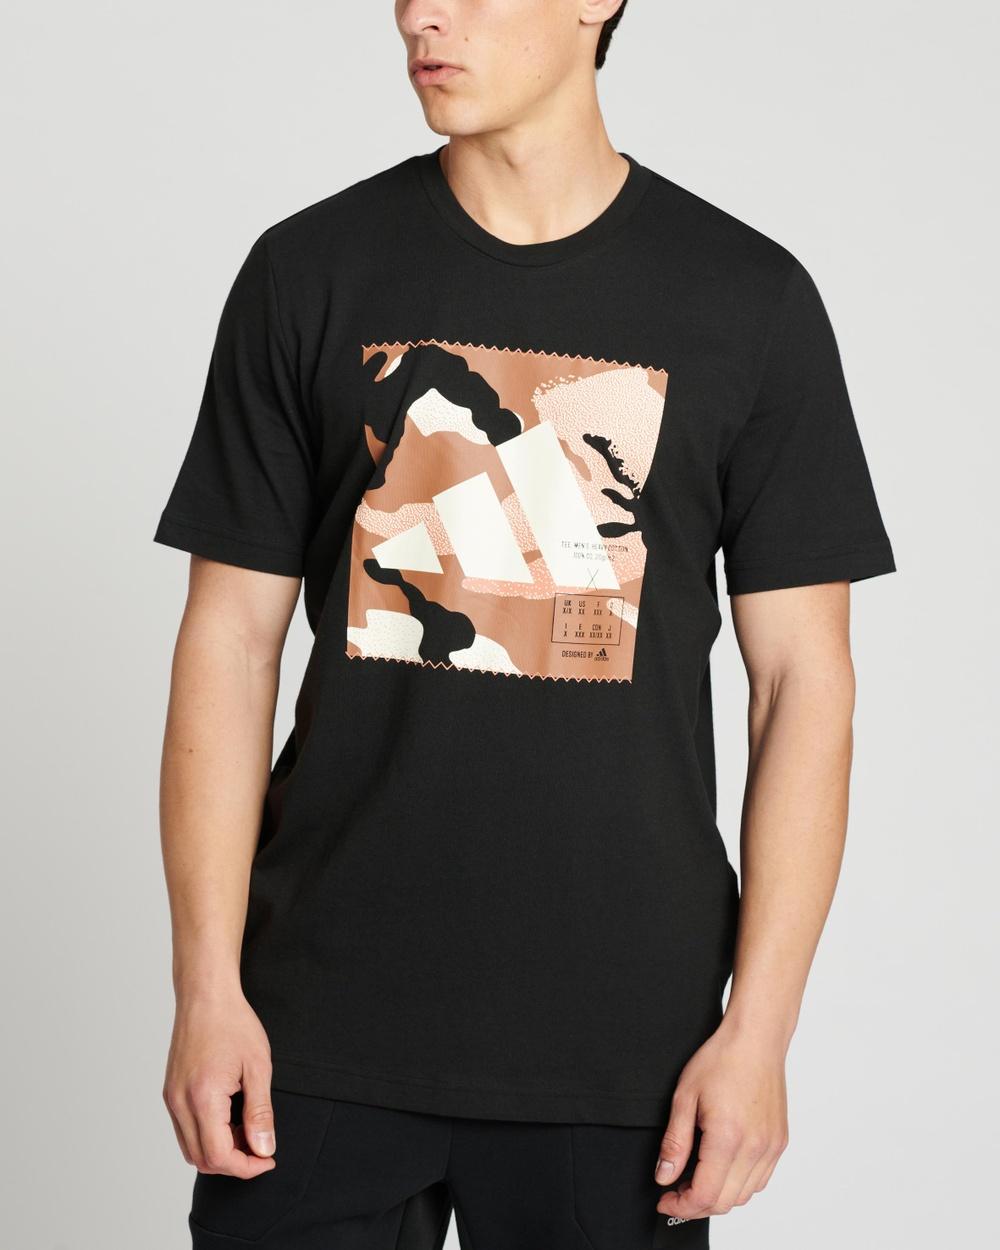 adidas Performance Athletics Graphic Tee Short Sleeve T-Shirts Black